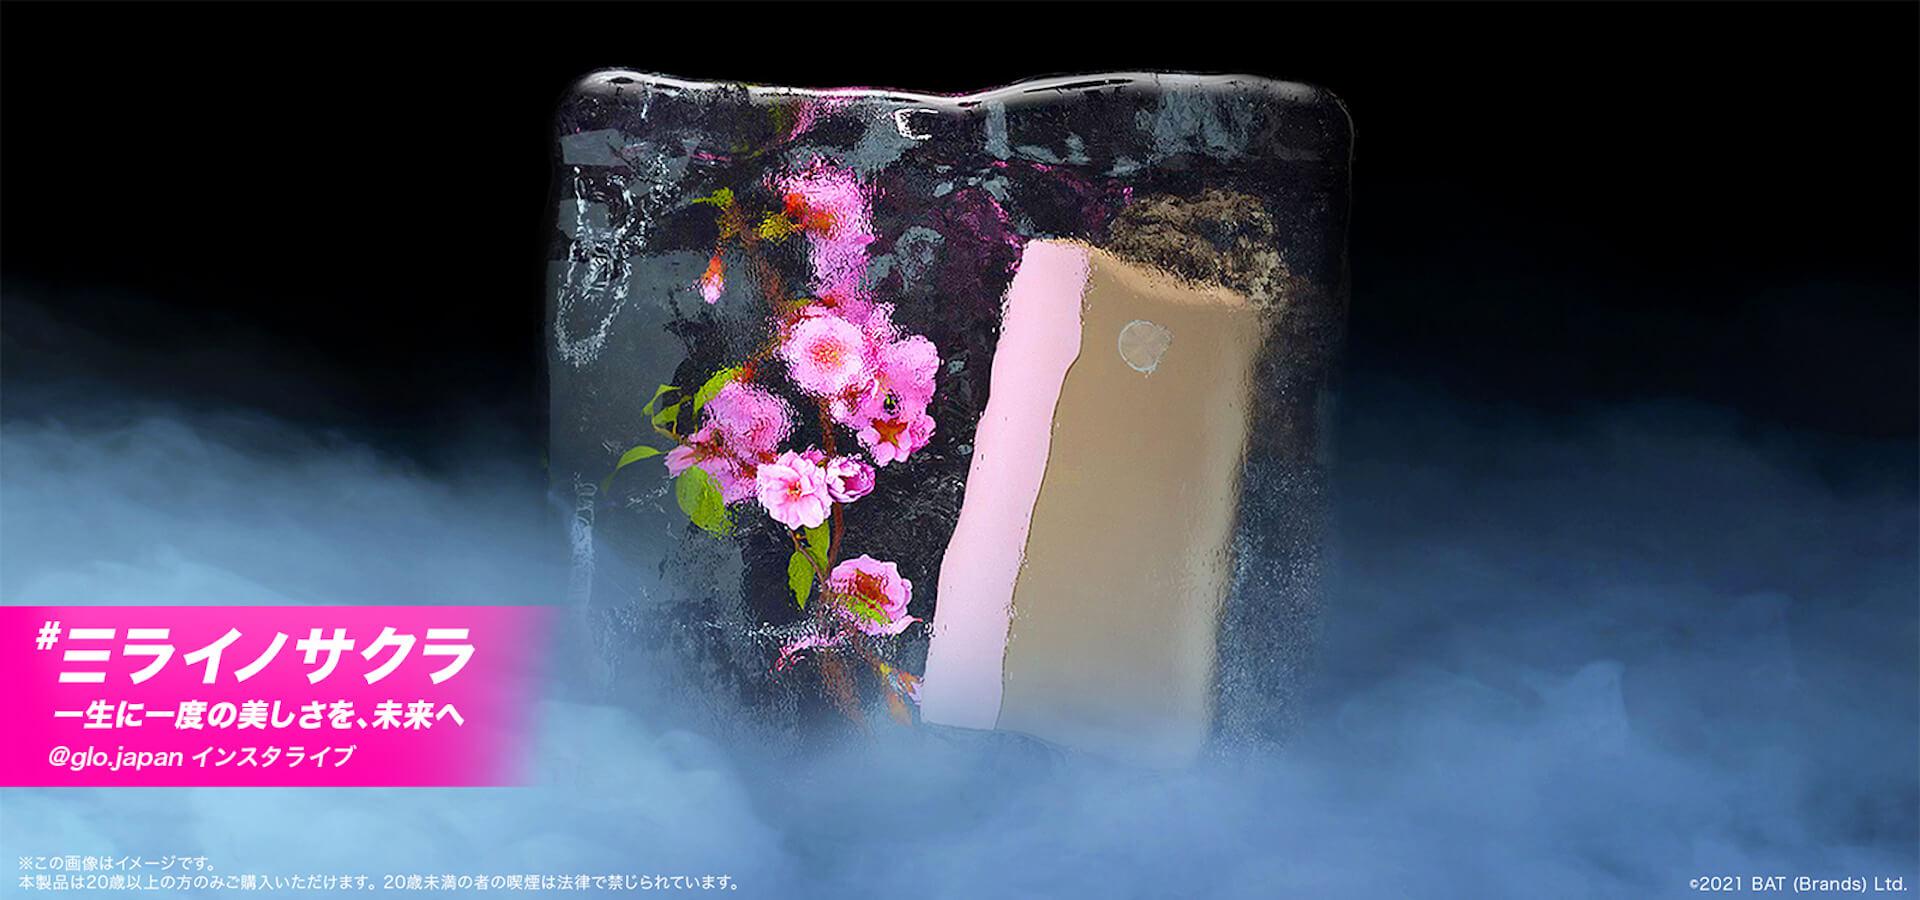 gloとblock.fmによるIGライブ「#ミライノサクラ」が開催決定!SKY-HI、☆Taku Takahashi、tofubeatsらが桜色のステージでライブ music210406_glo-blockfm-210406_2